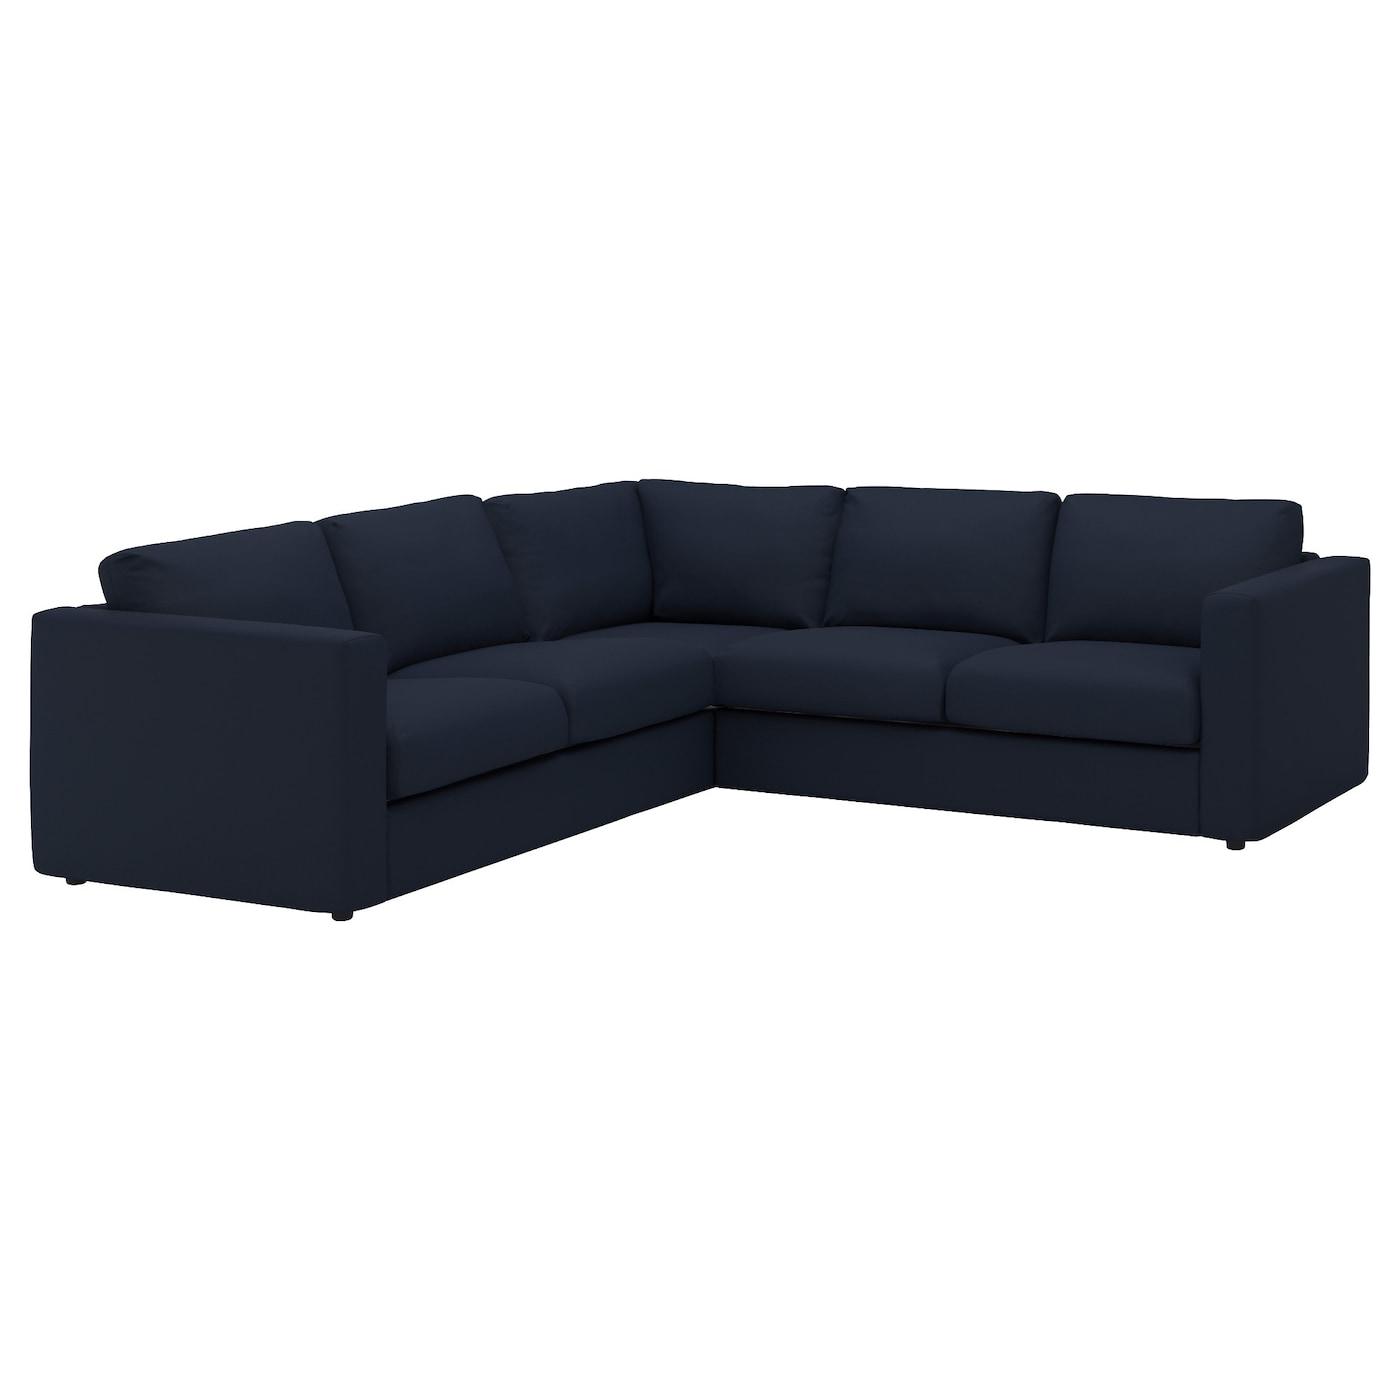 Vimle corner sofa 4 seat gr sbo black blue ikea - Ikea sofas cama 3 plazas ...